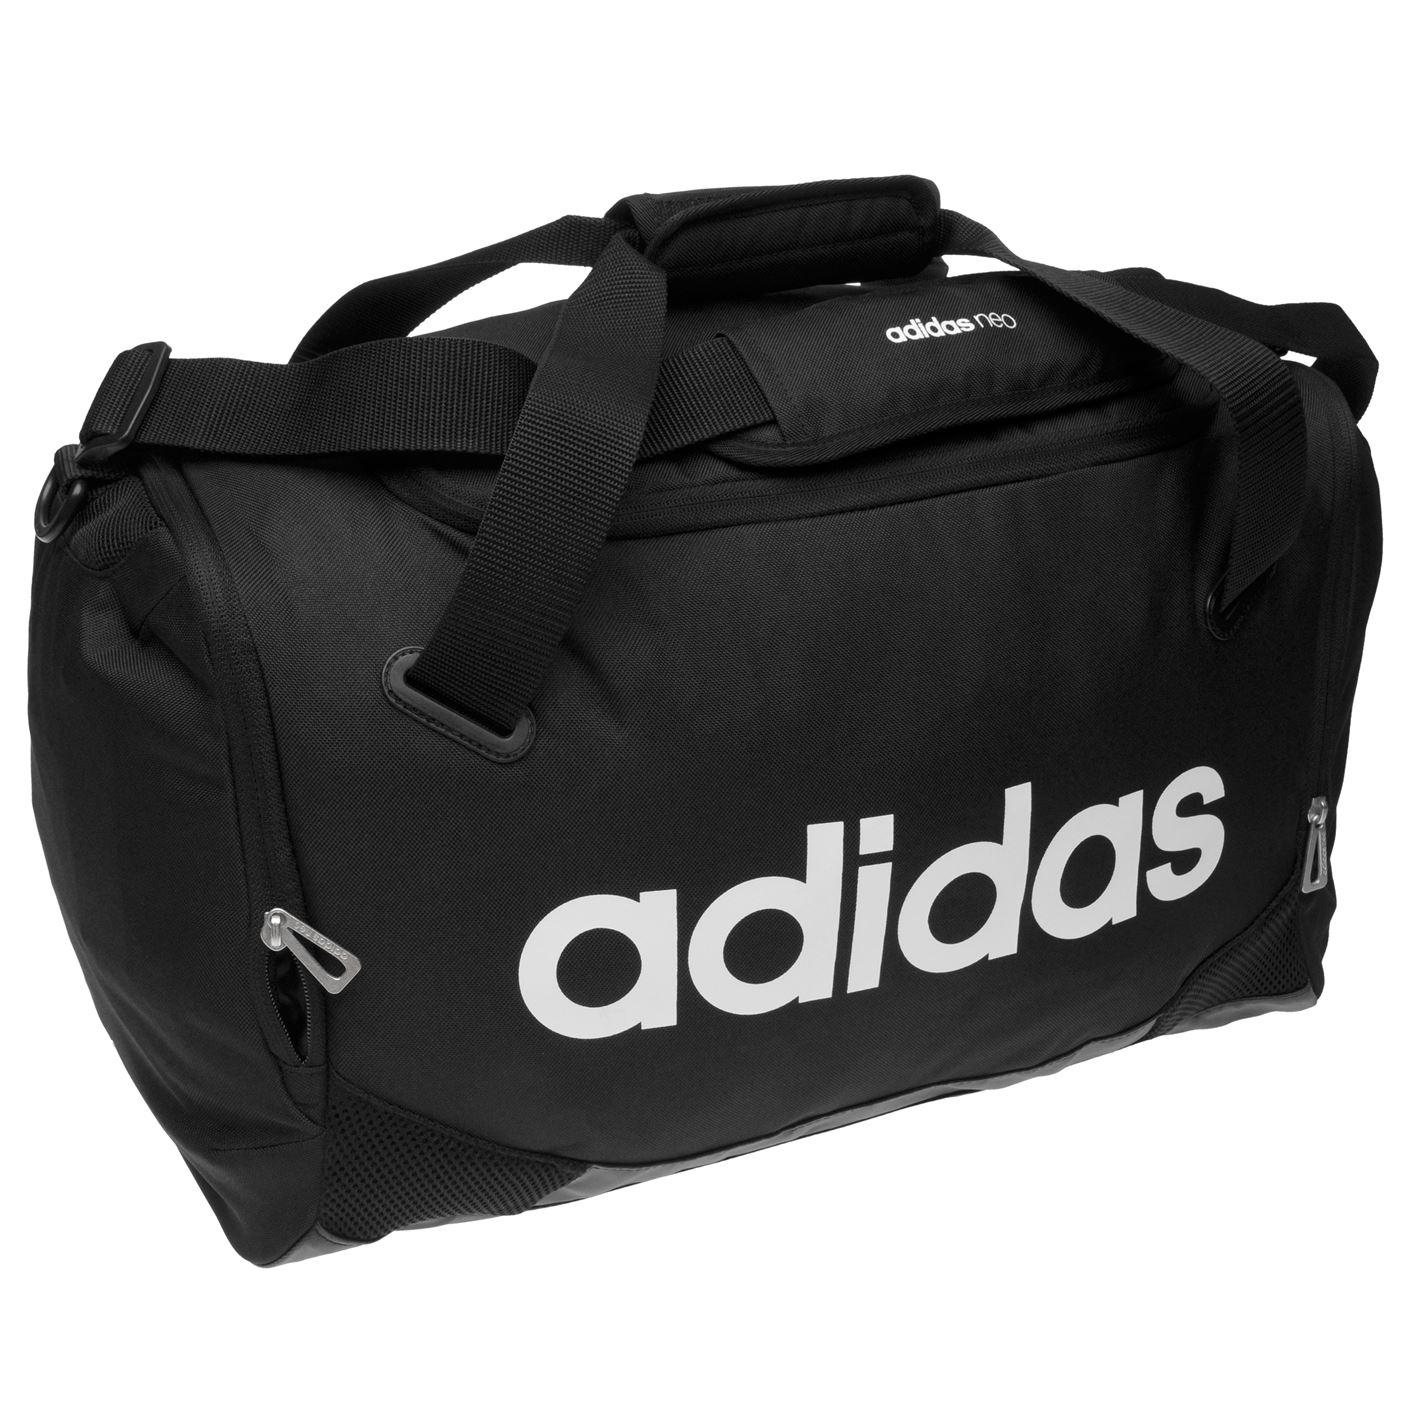 Adidas Linear Team Bag Small